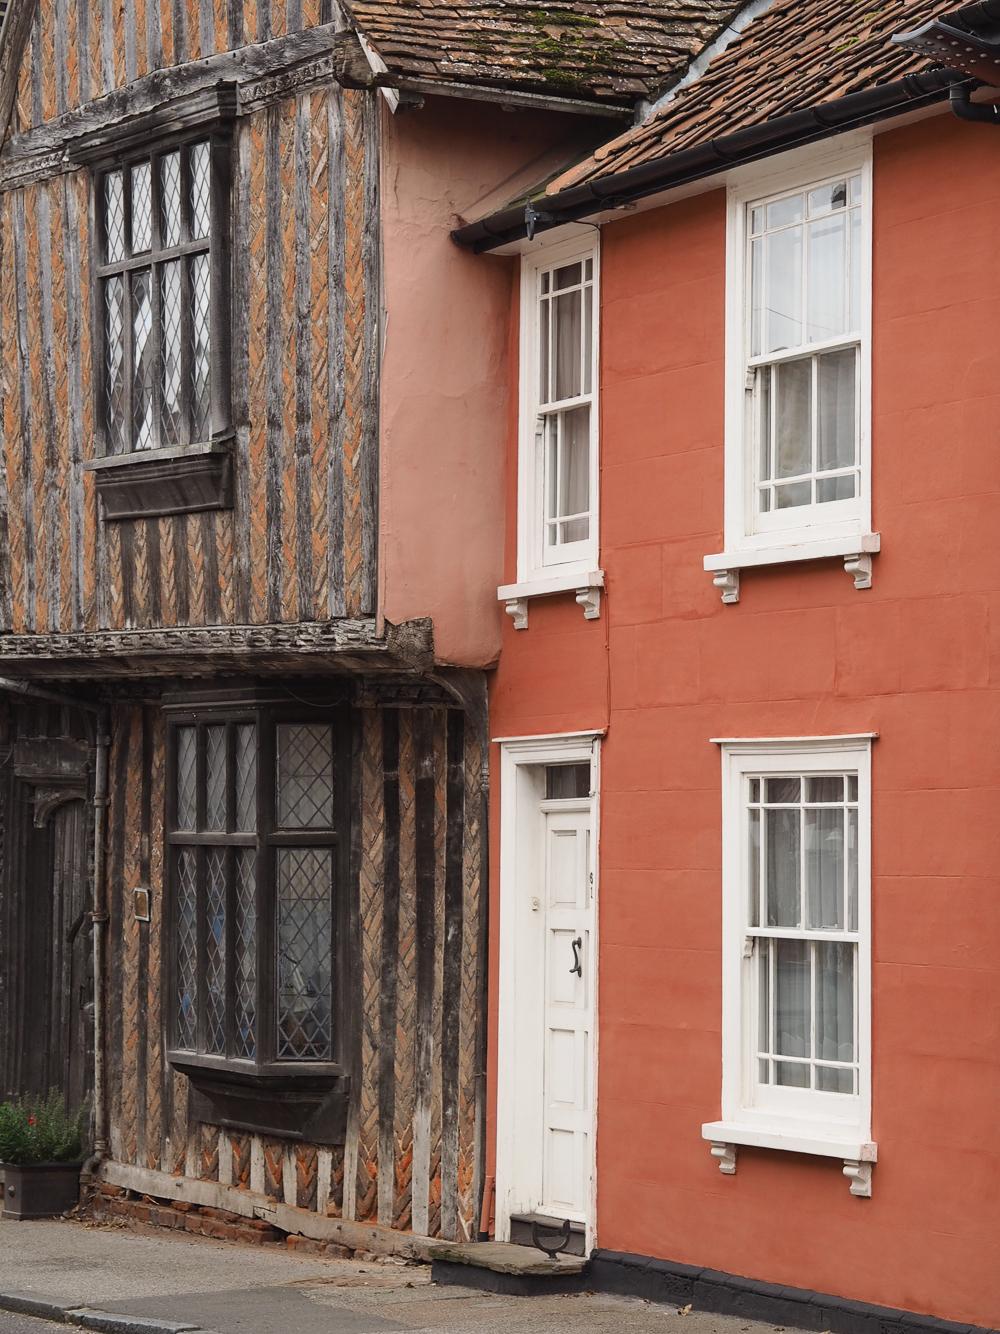 Coloured houses in Lavenham, Suffolk | Design Hunter